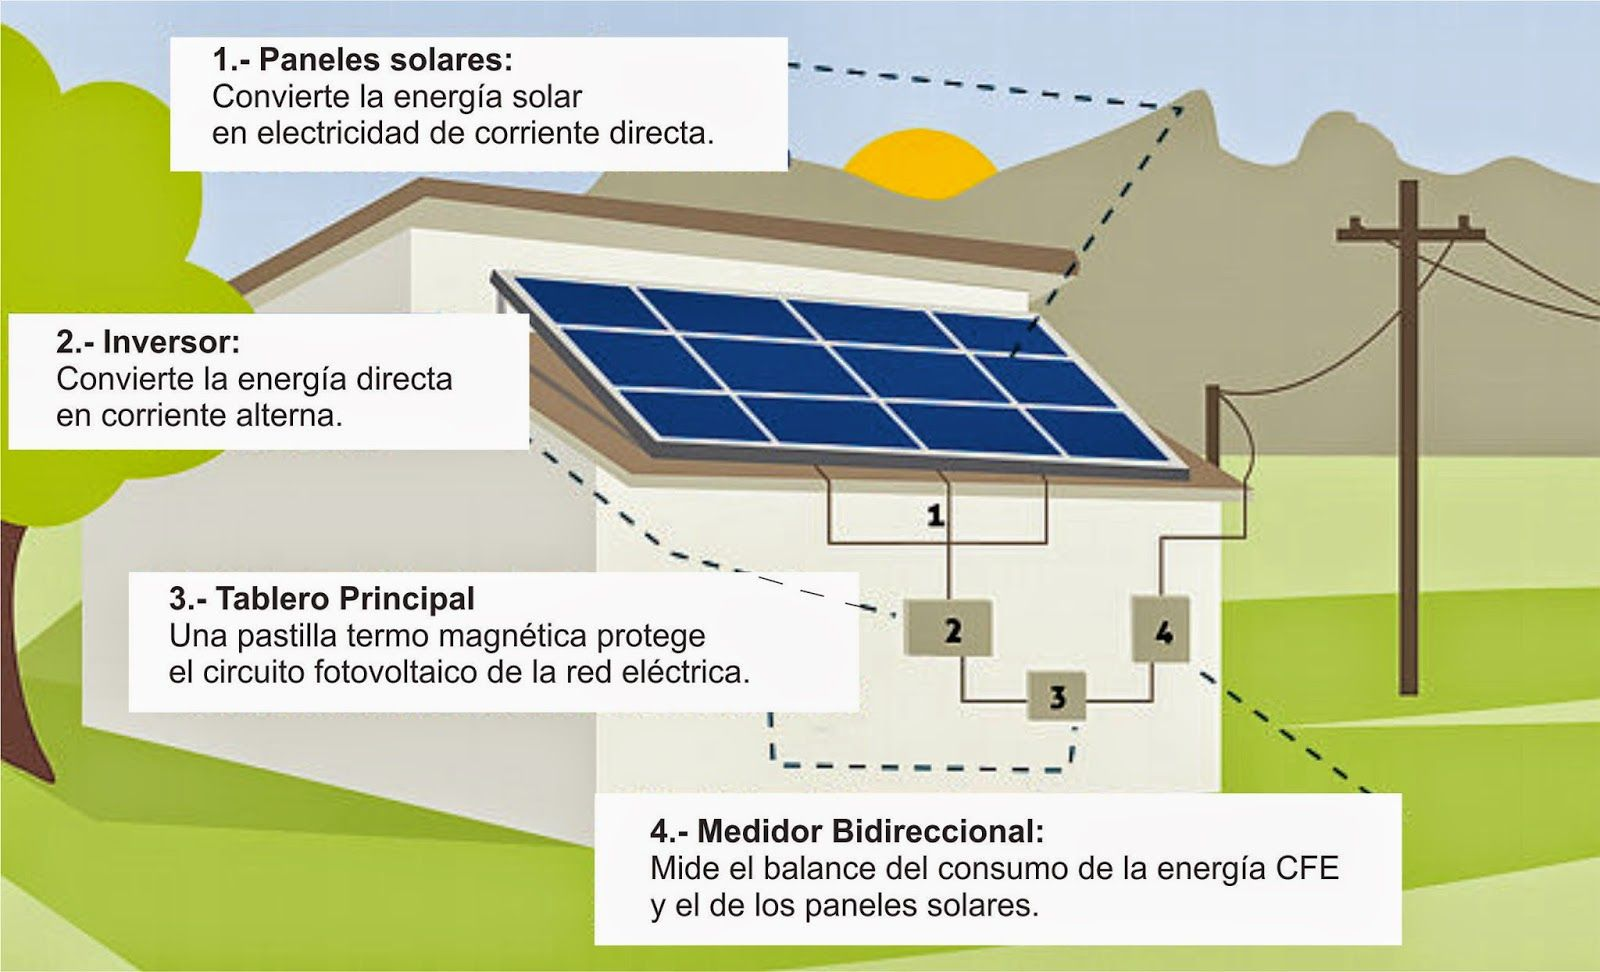 Paneles solares en casa arquitectura pinterest panel - Paneles solares para abastecer una casa ...